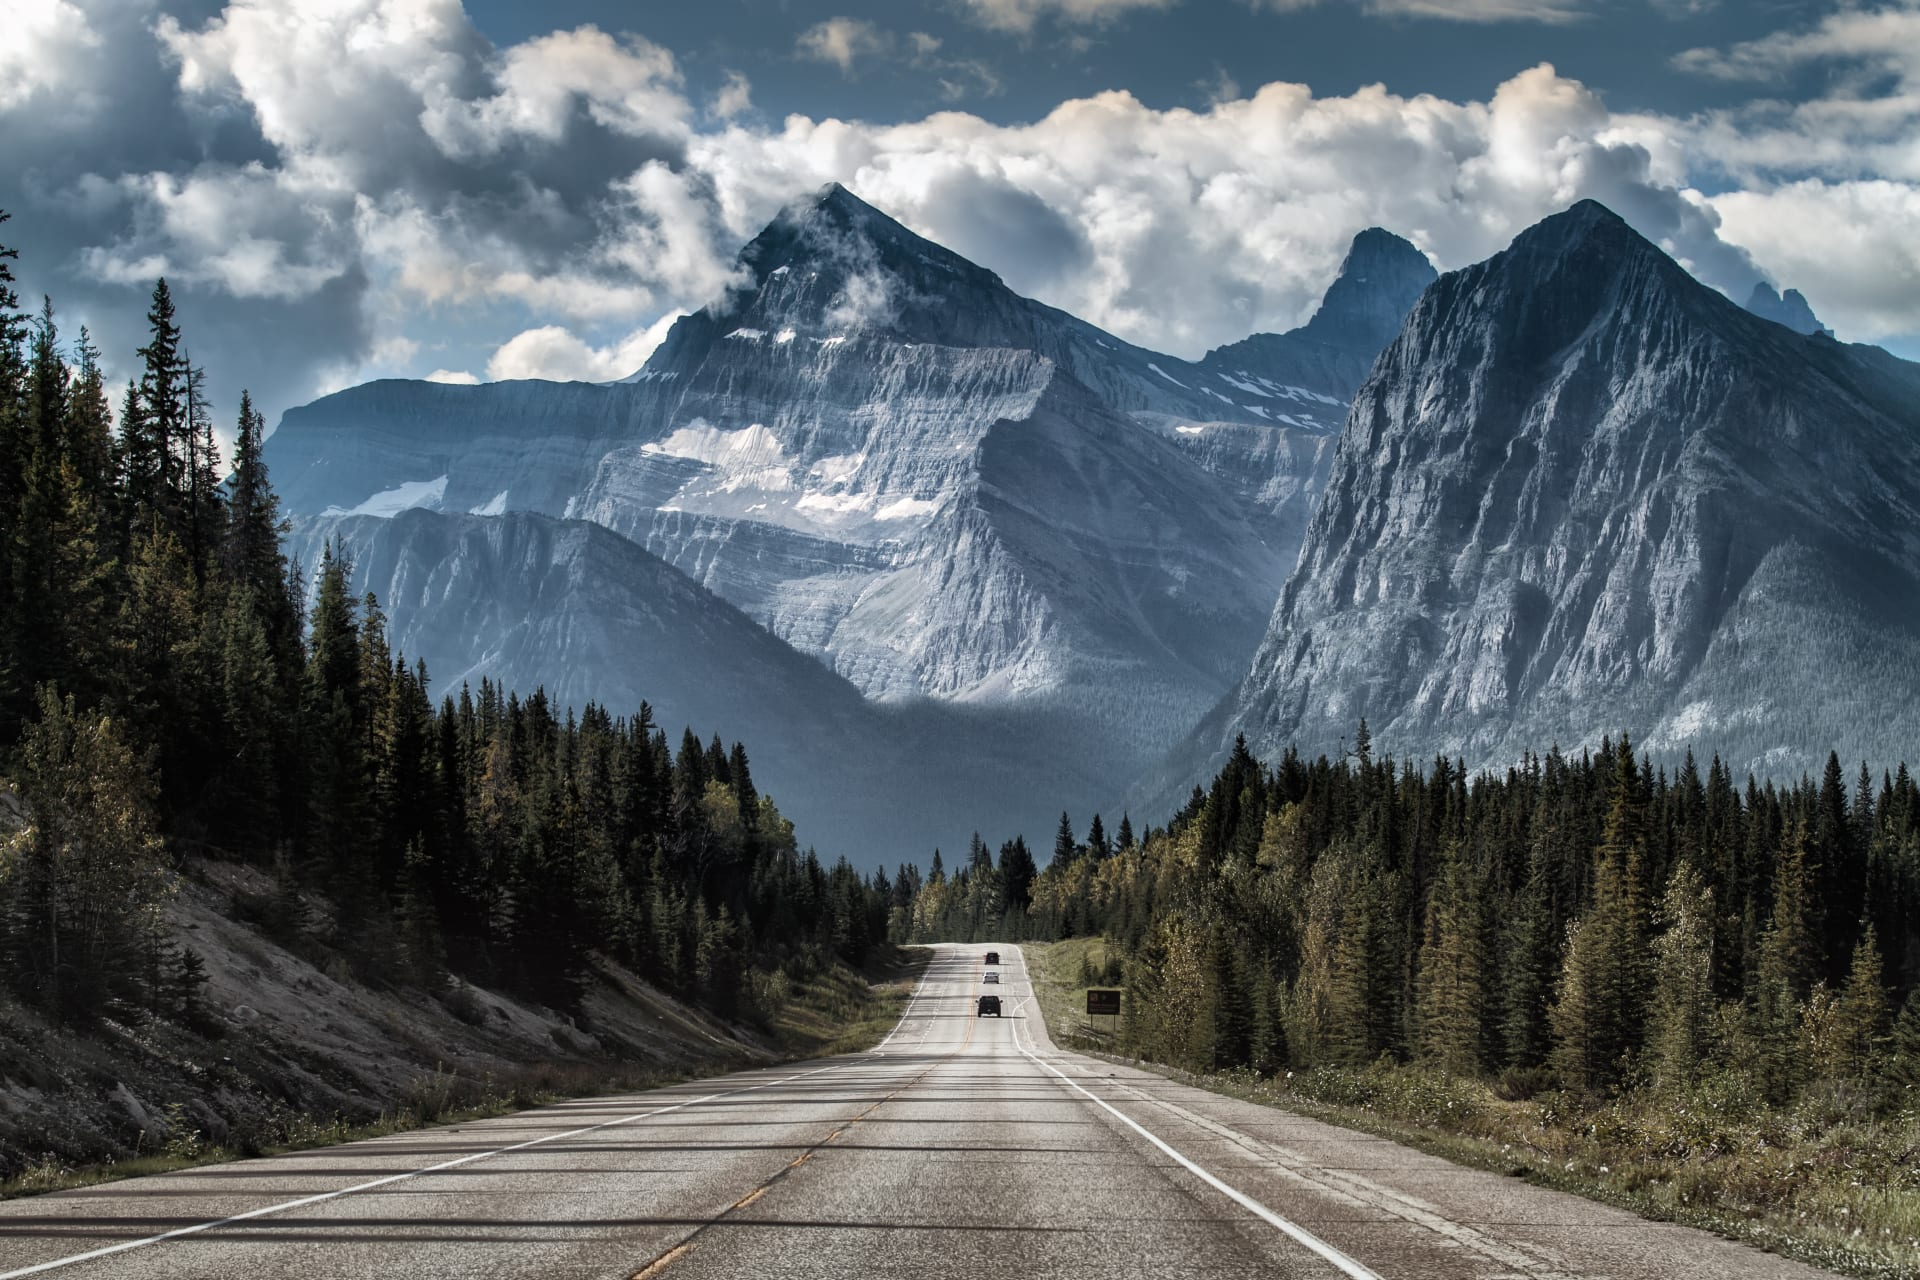 Banff - The Majestic Canadian Rockies- Banff National Park